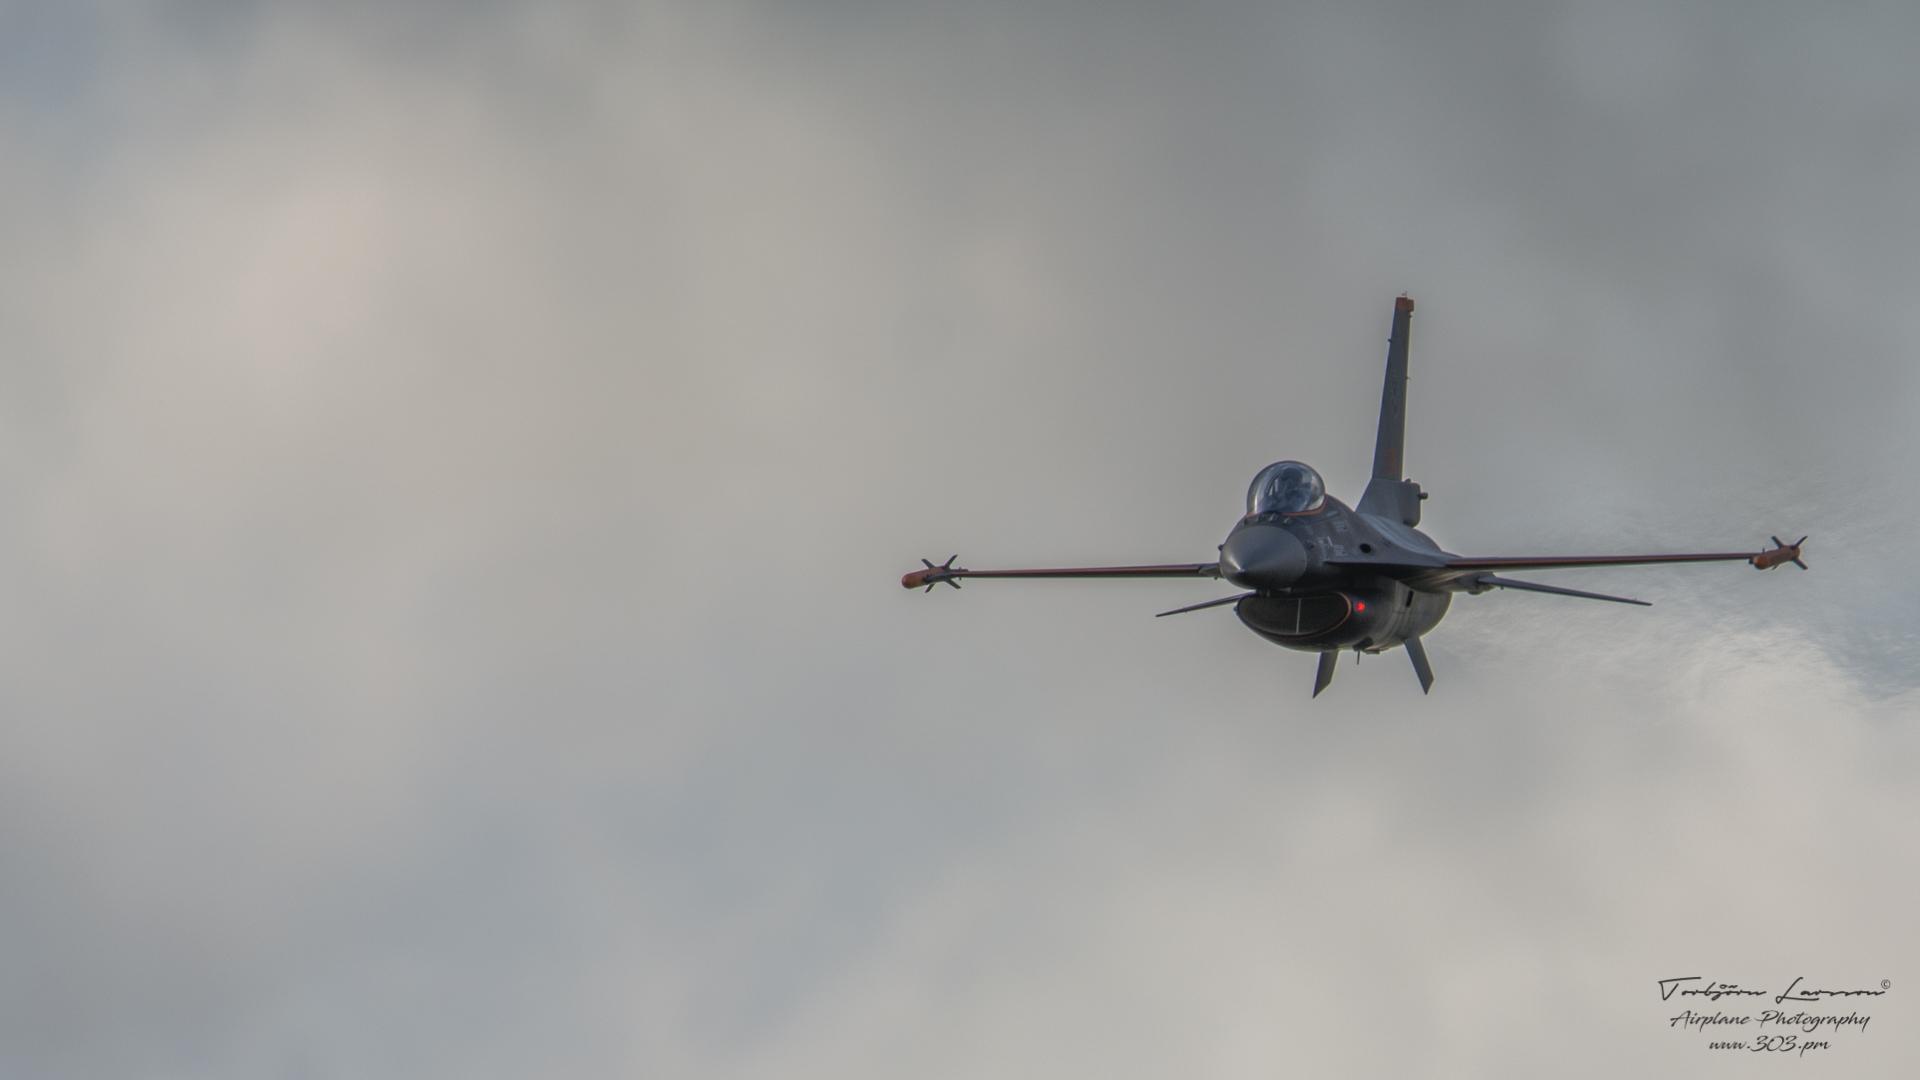 Radiostyrt - Arve Jensen - F-16 Falcon